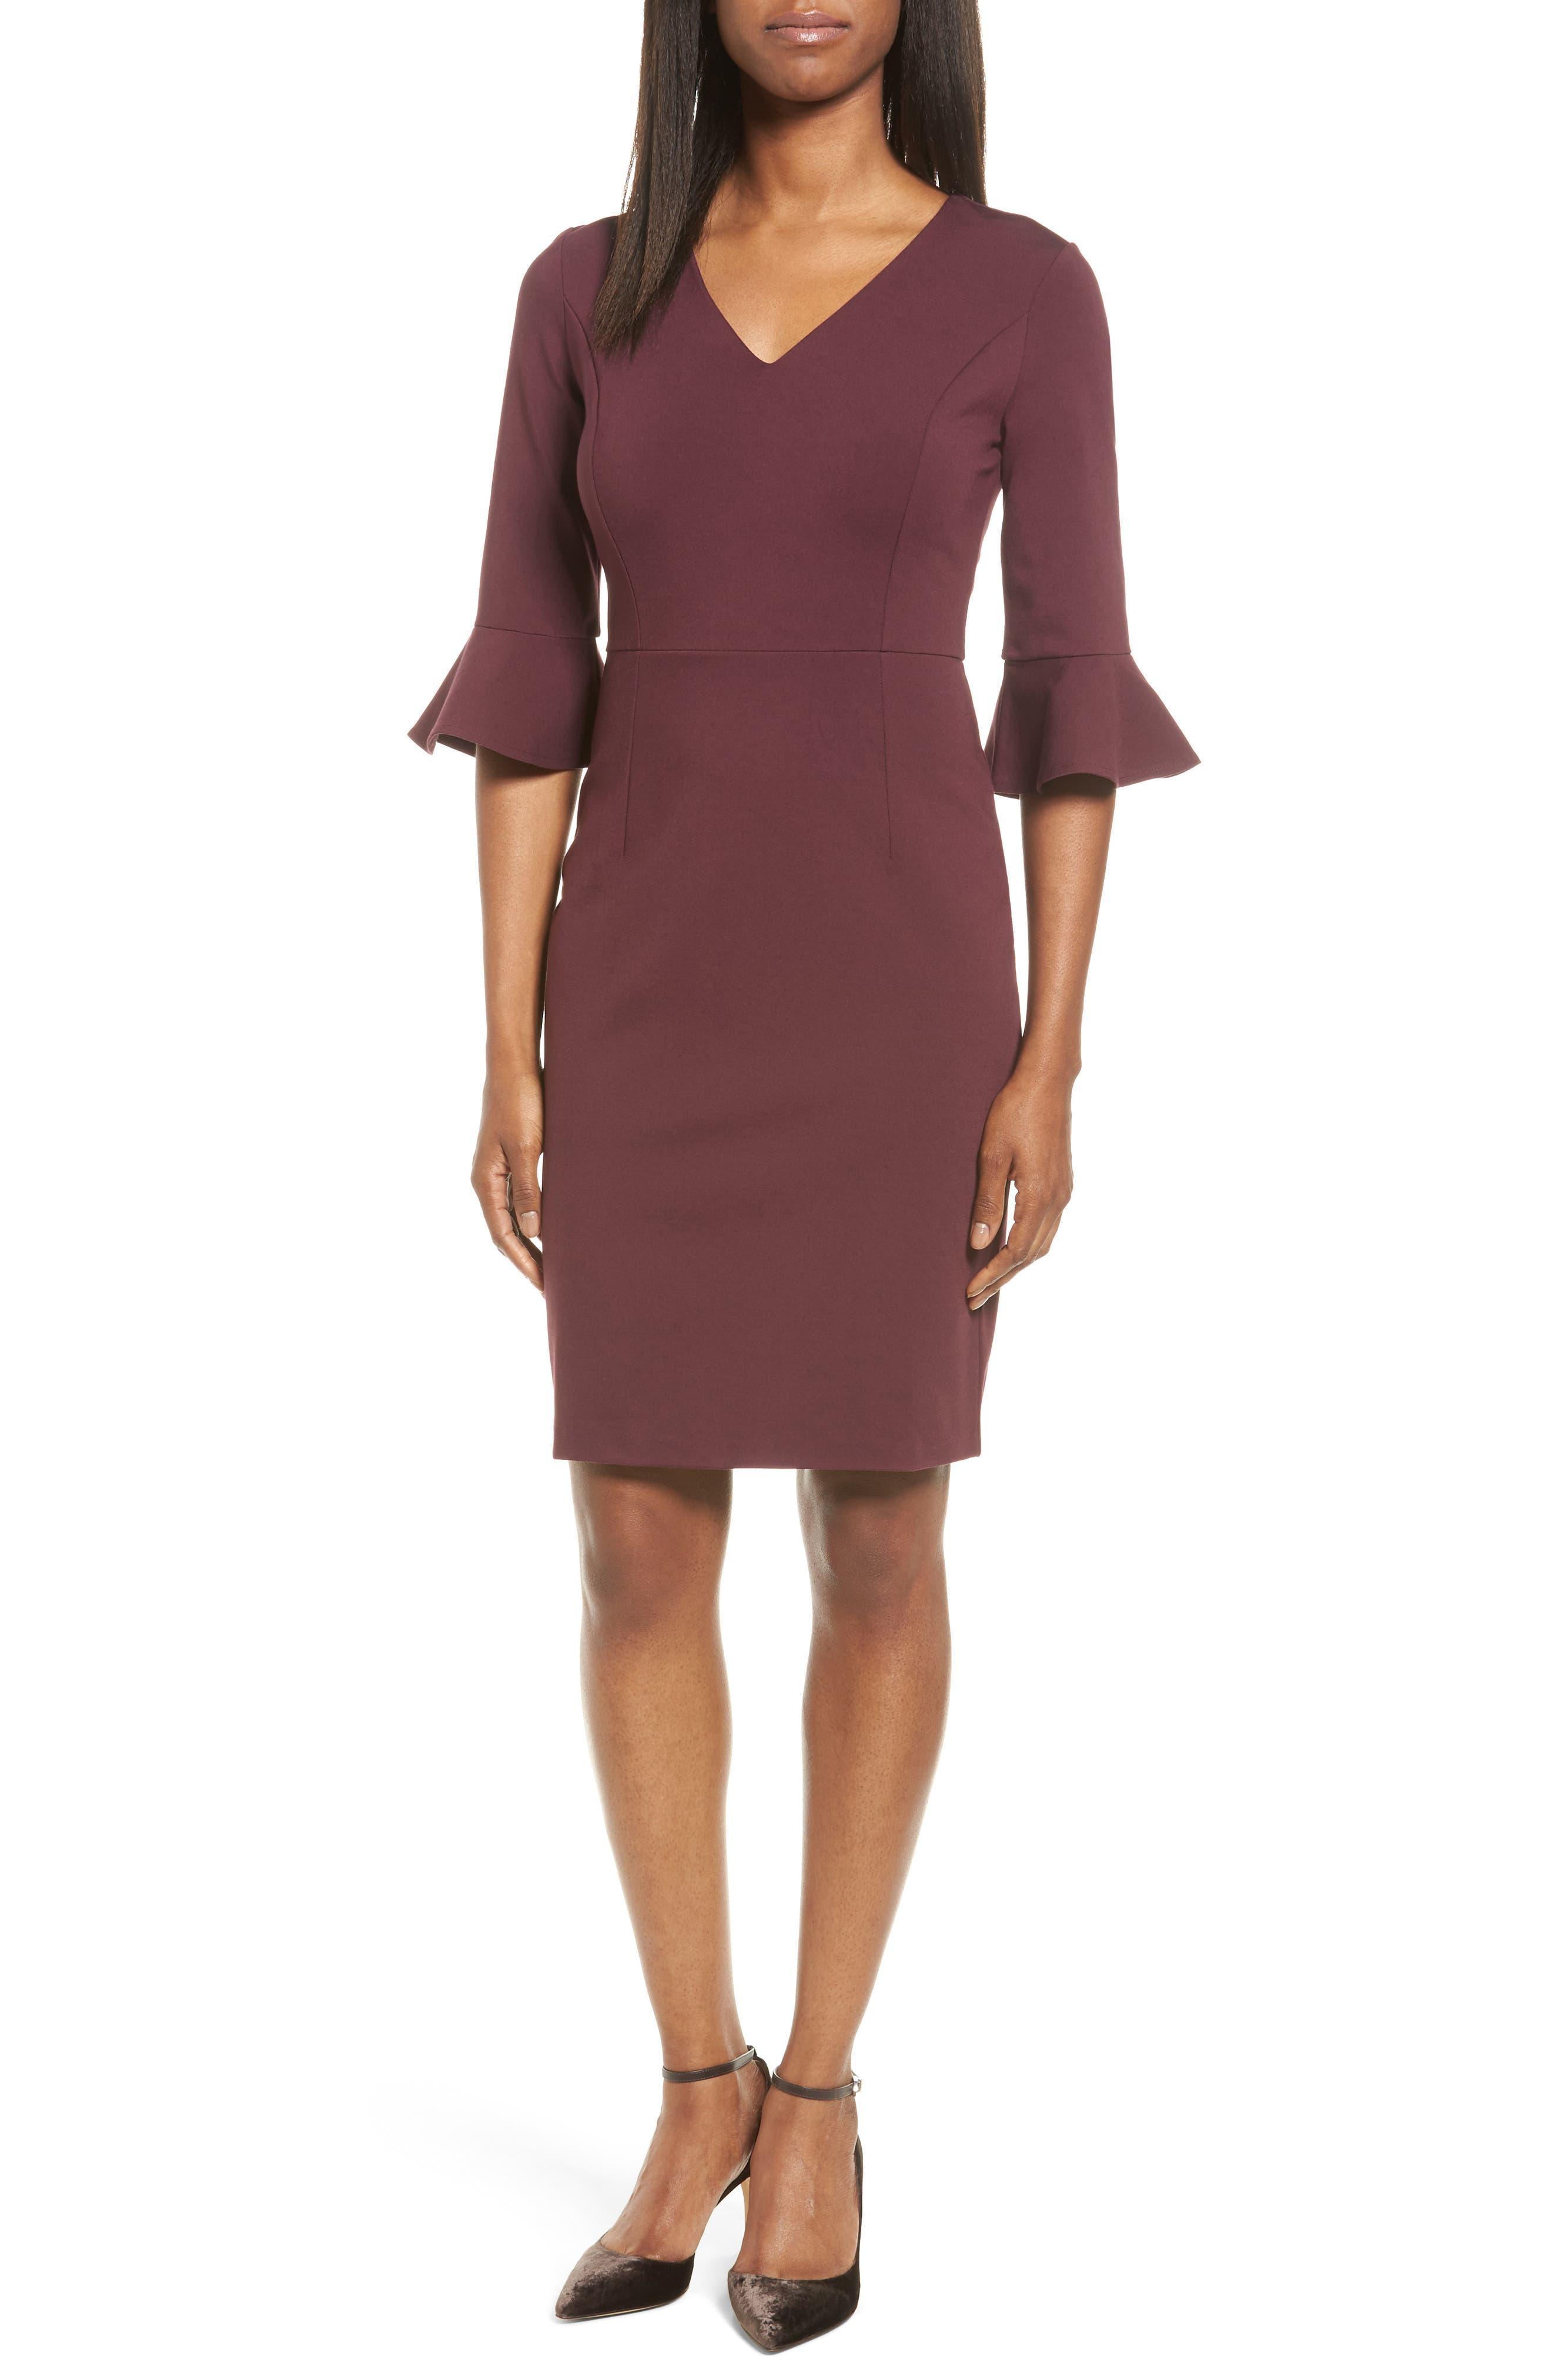 Alternate Image 1 Selected - Halogen® Ruffle Sleeve Ponte Sheath Dress (Regular & Petite)